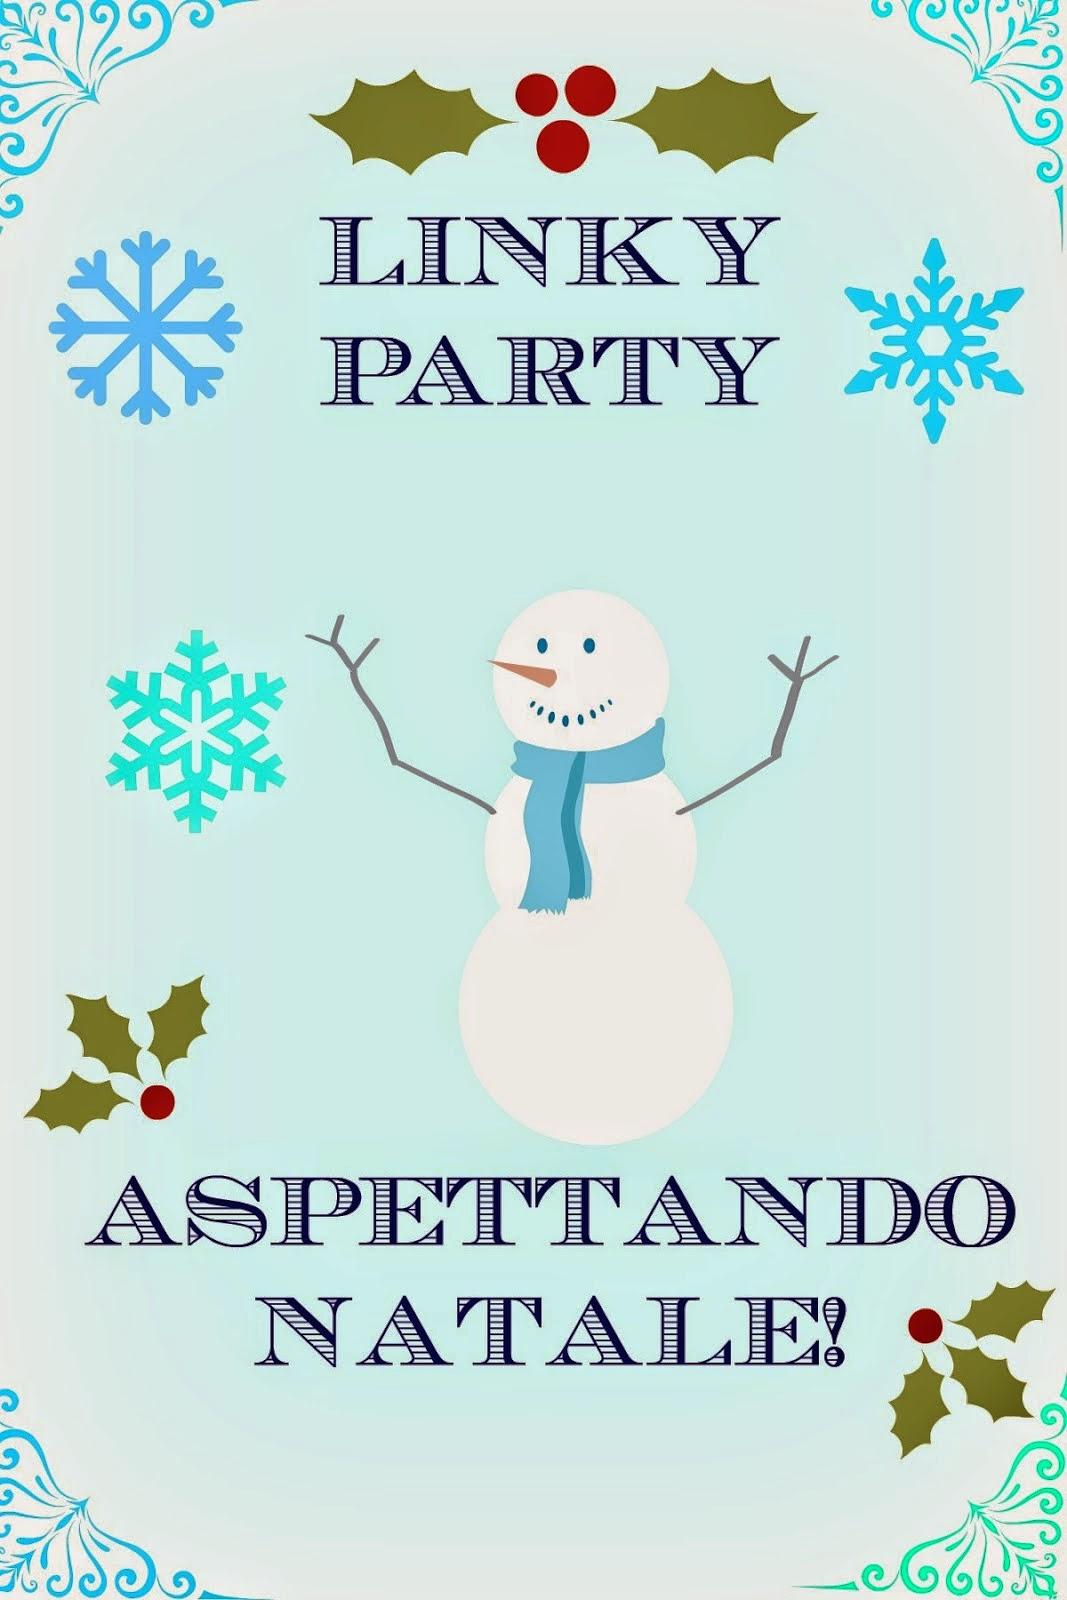 http://ilvolodiunafarfalla.blogspot.it/2014/11/linky-party-aspettando-natale.html